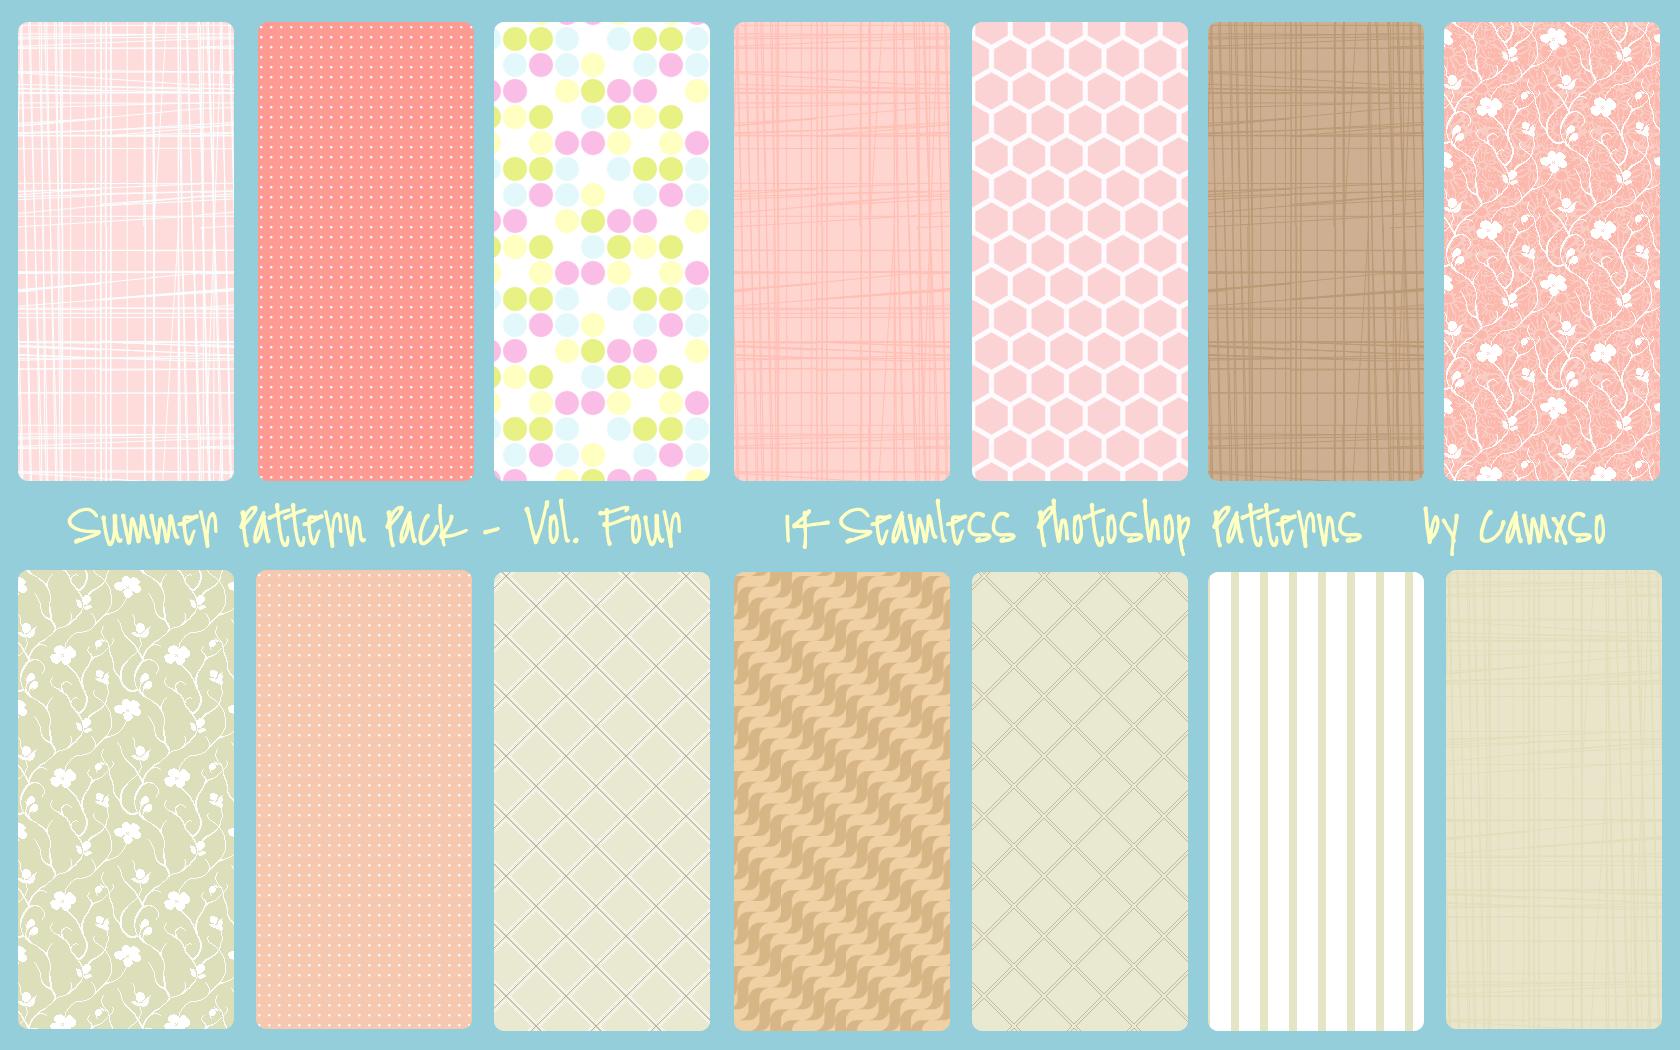 Summer Pattern Pack Vol  4 by Camxso on DeviantArt